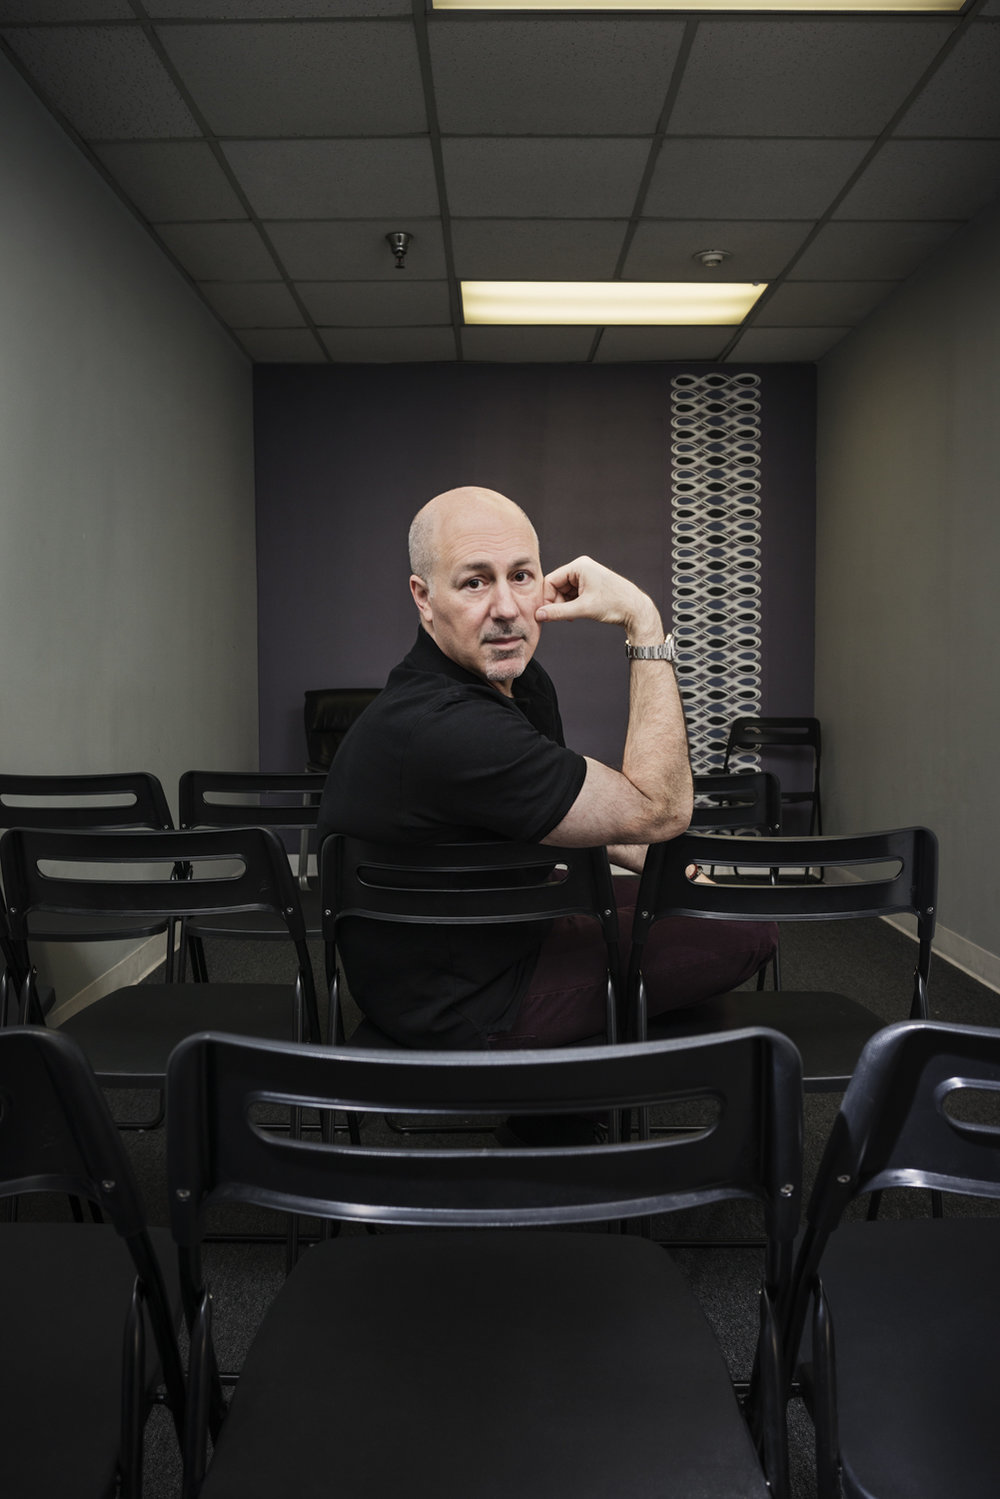 Scott David, Casting Director